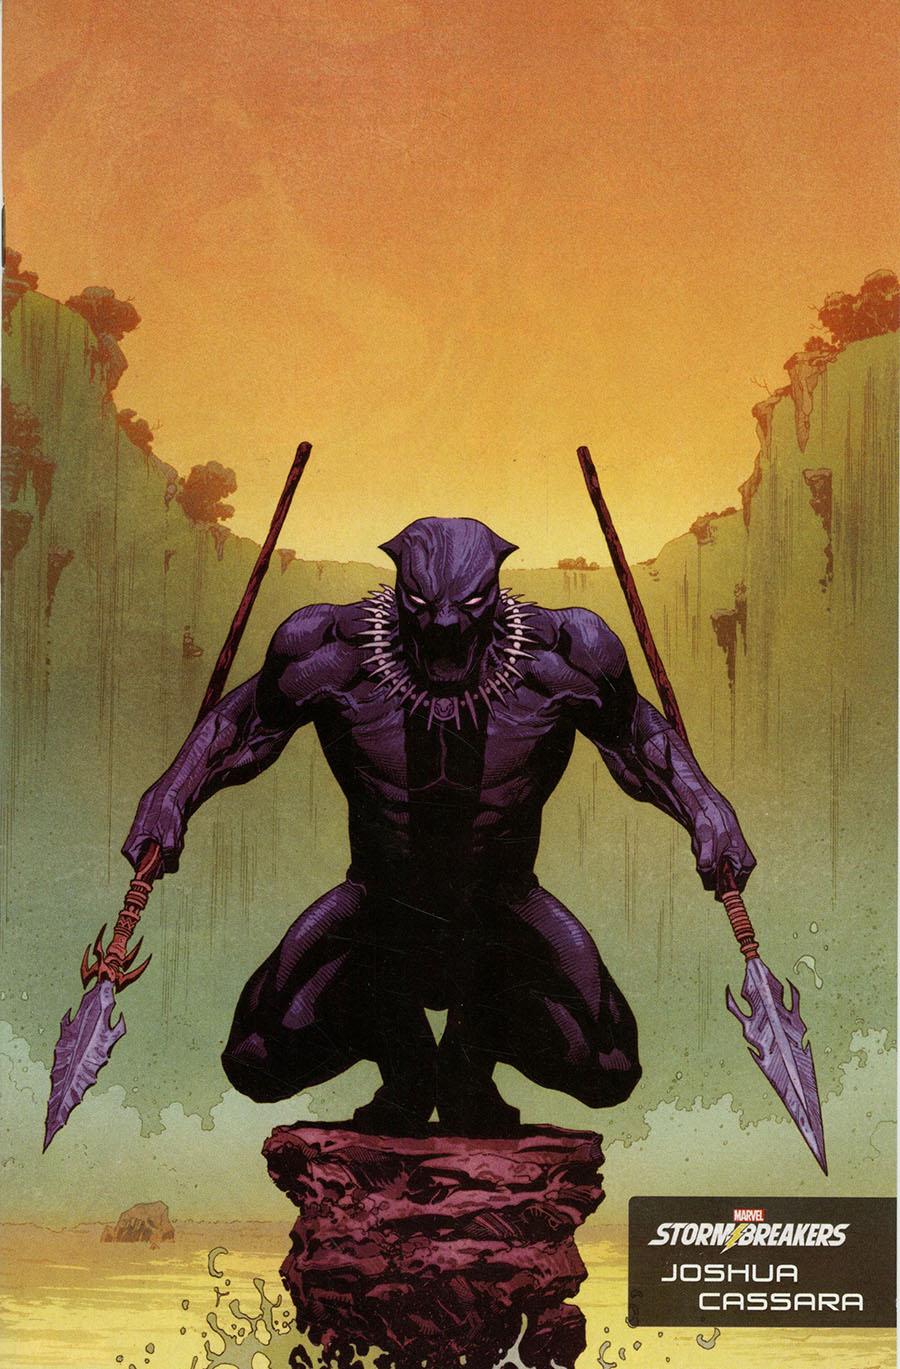 Avengers Vol 7 #40 Cover G Incentive Joshua Cassara Stormbreakers Variant Cover